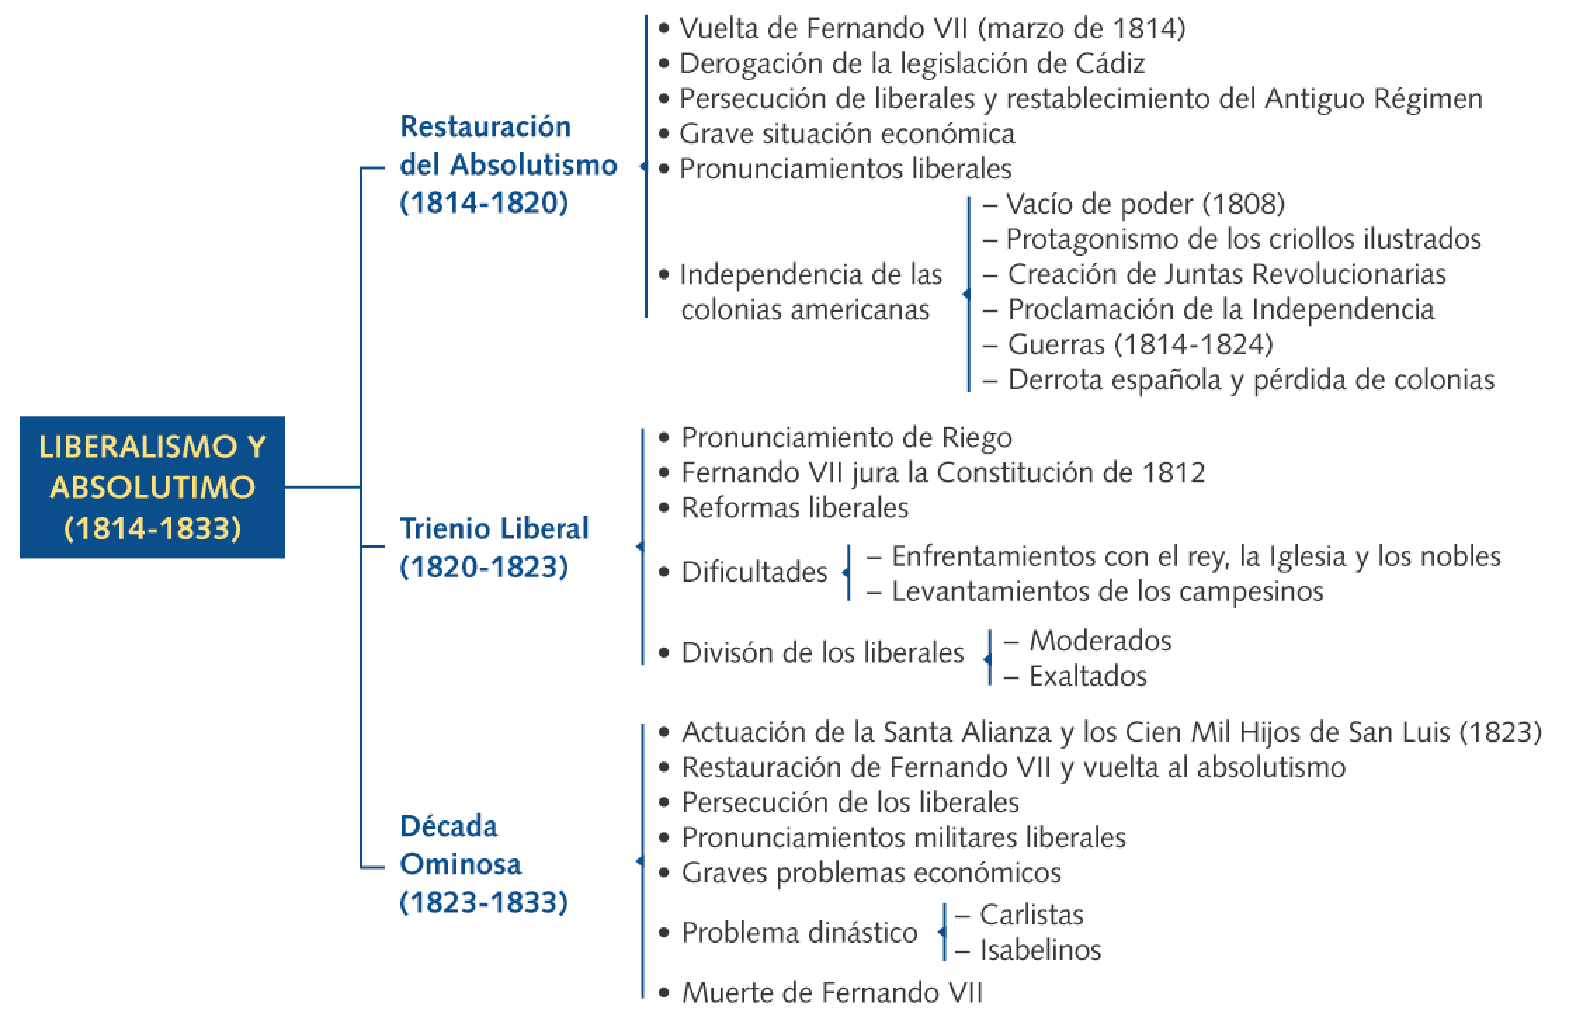 Historia De Espana En Resumen